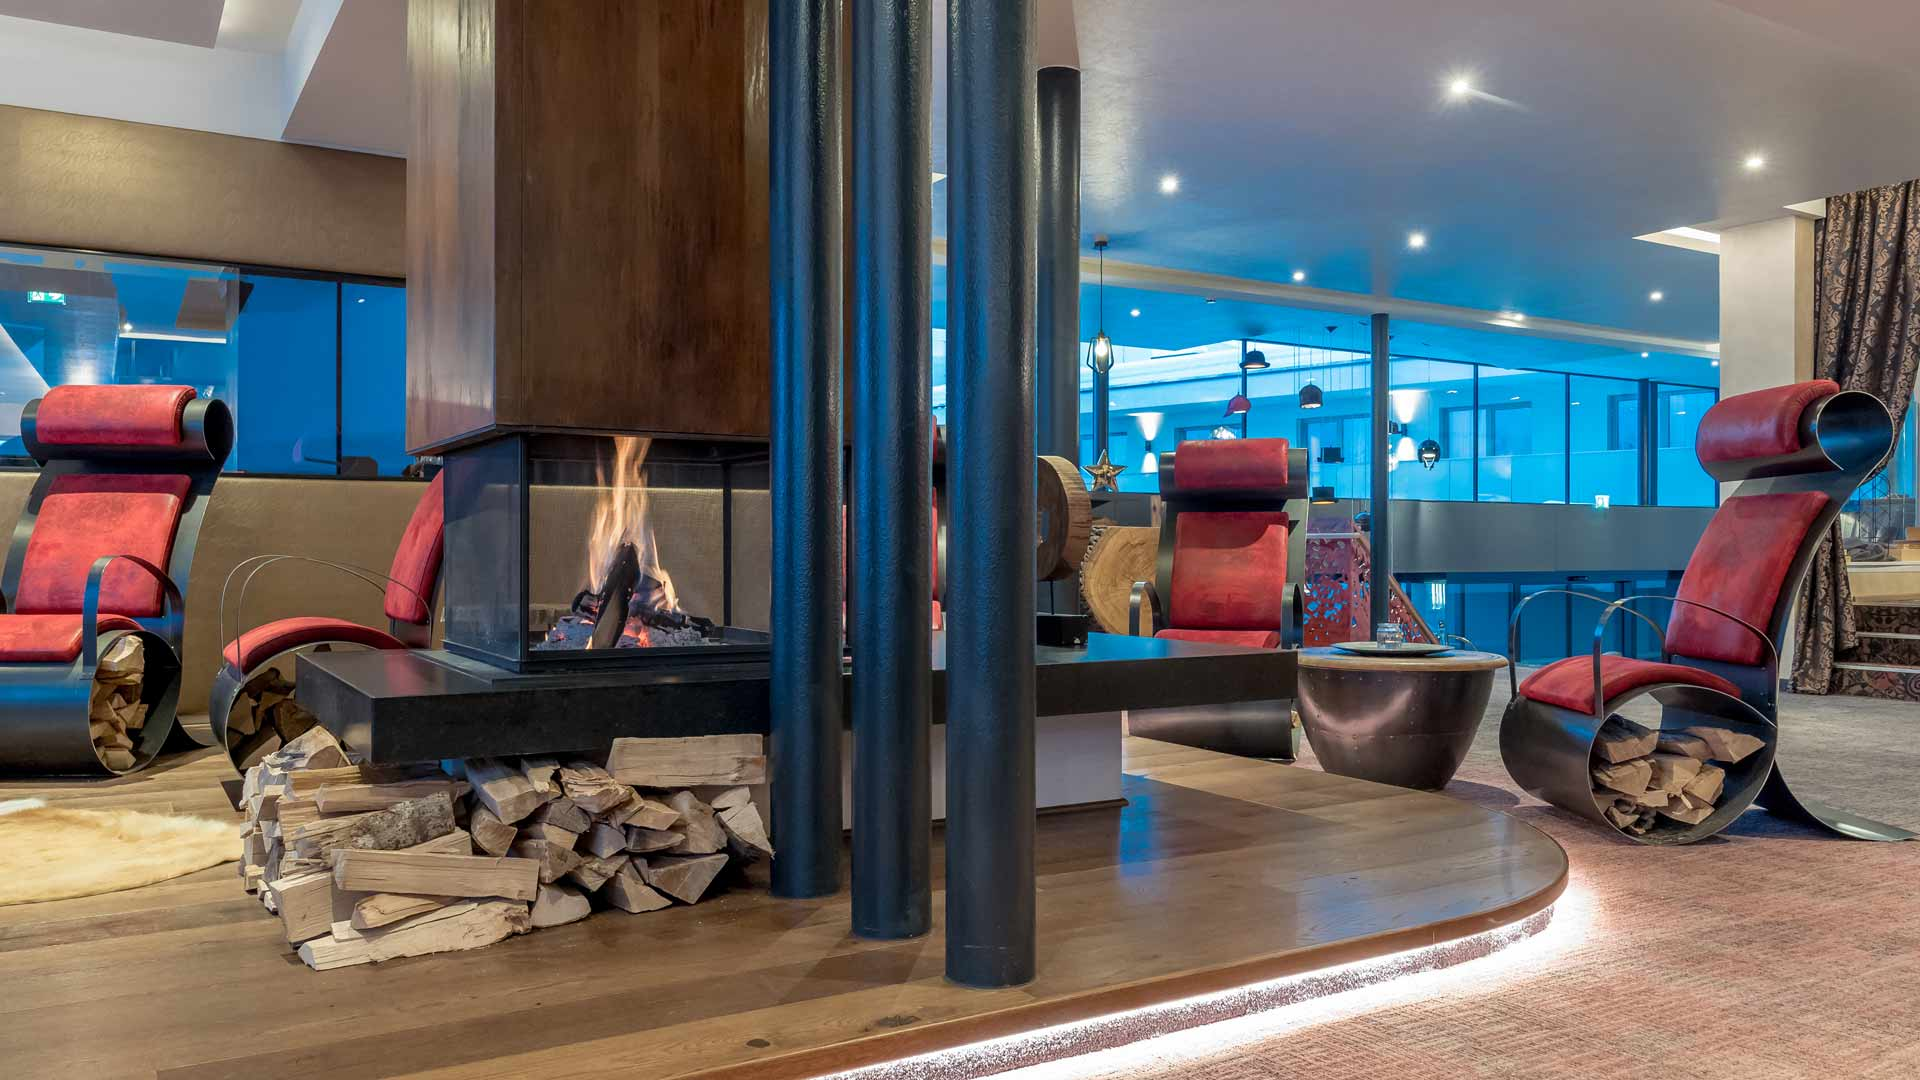 Lodge-Hausbar IDEAL - Sporthotel IDEAL *** superior